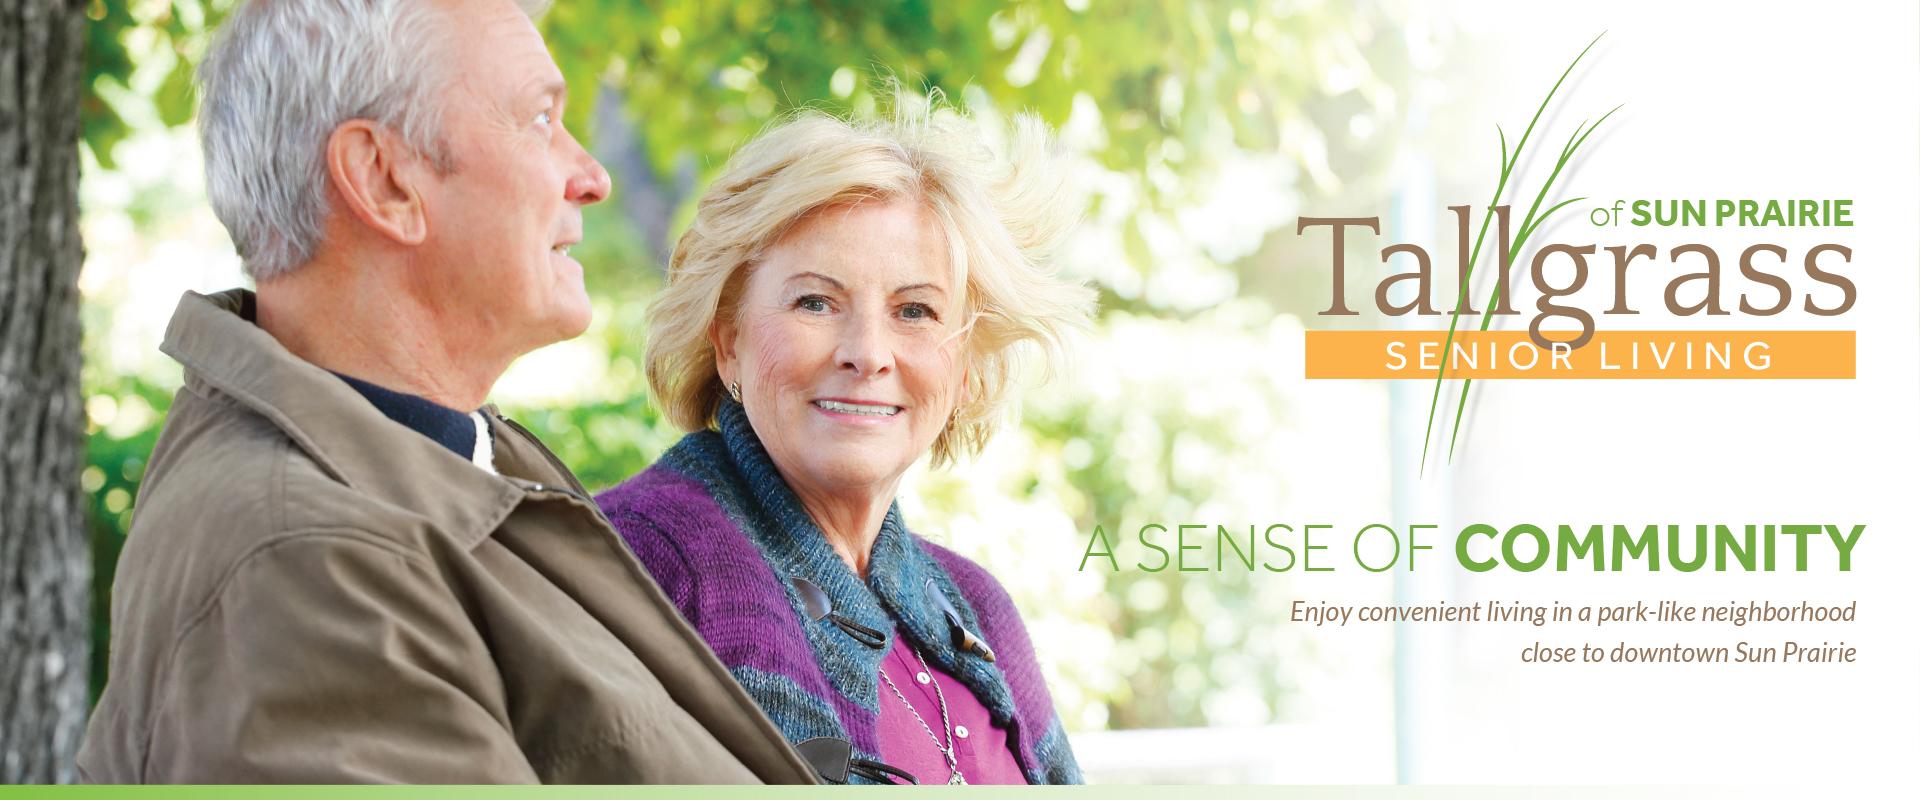 Older adult couple enjoying the park like atmosphere around our senior living community.